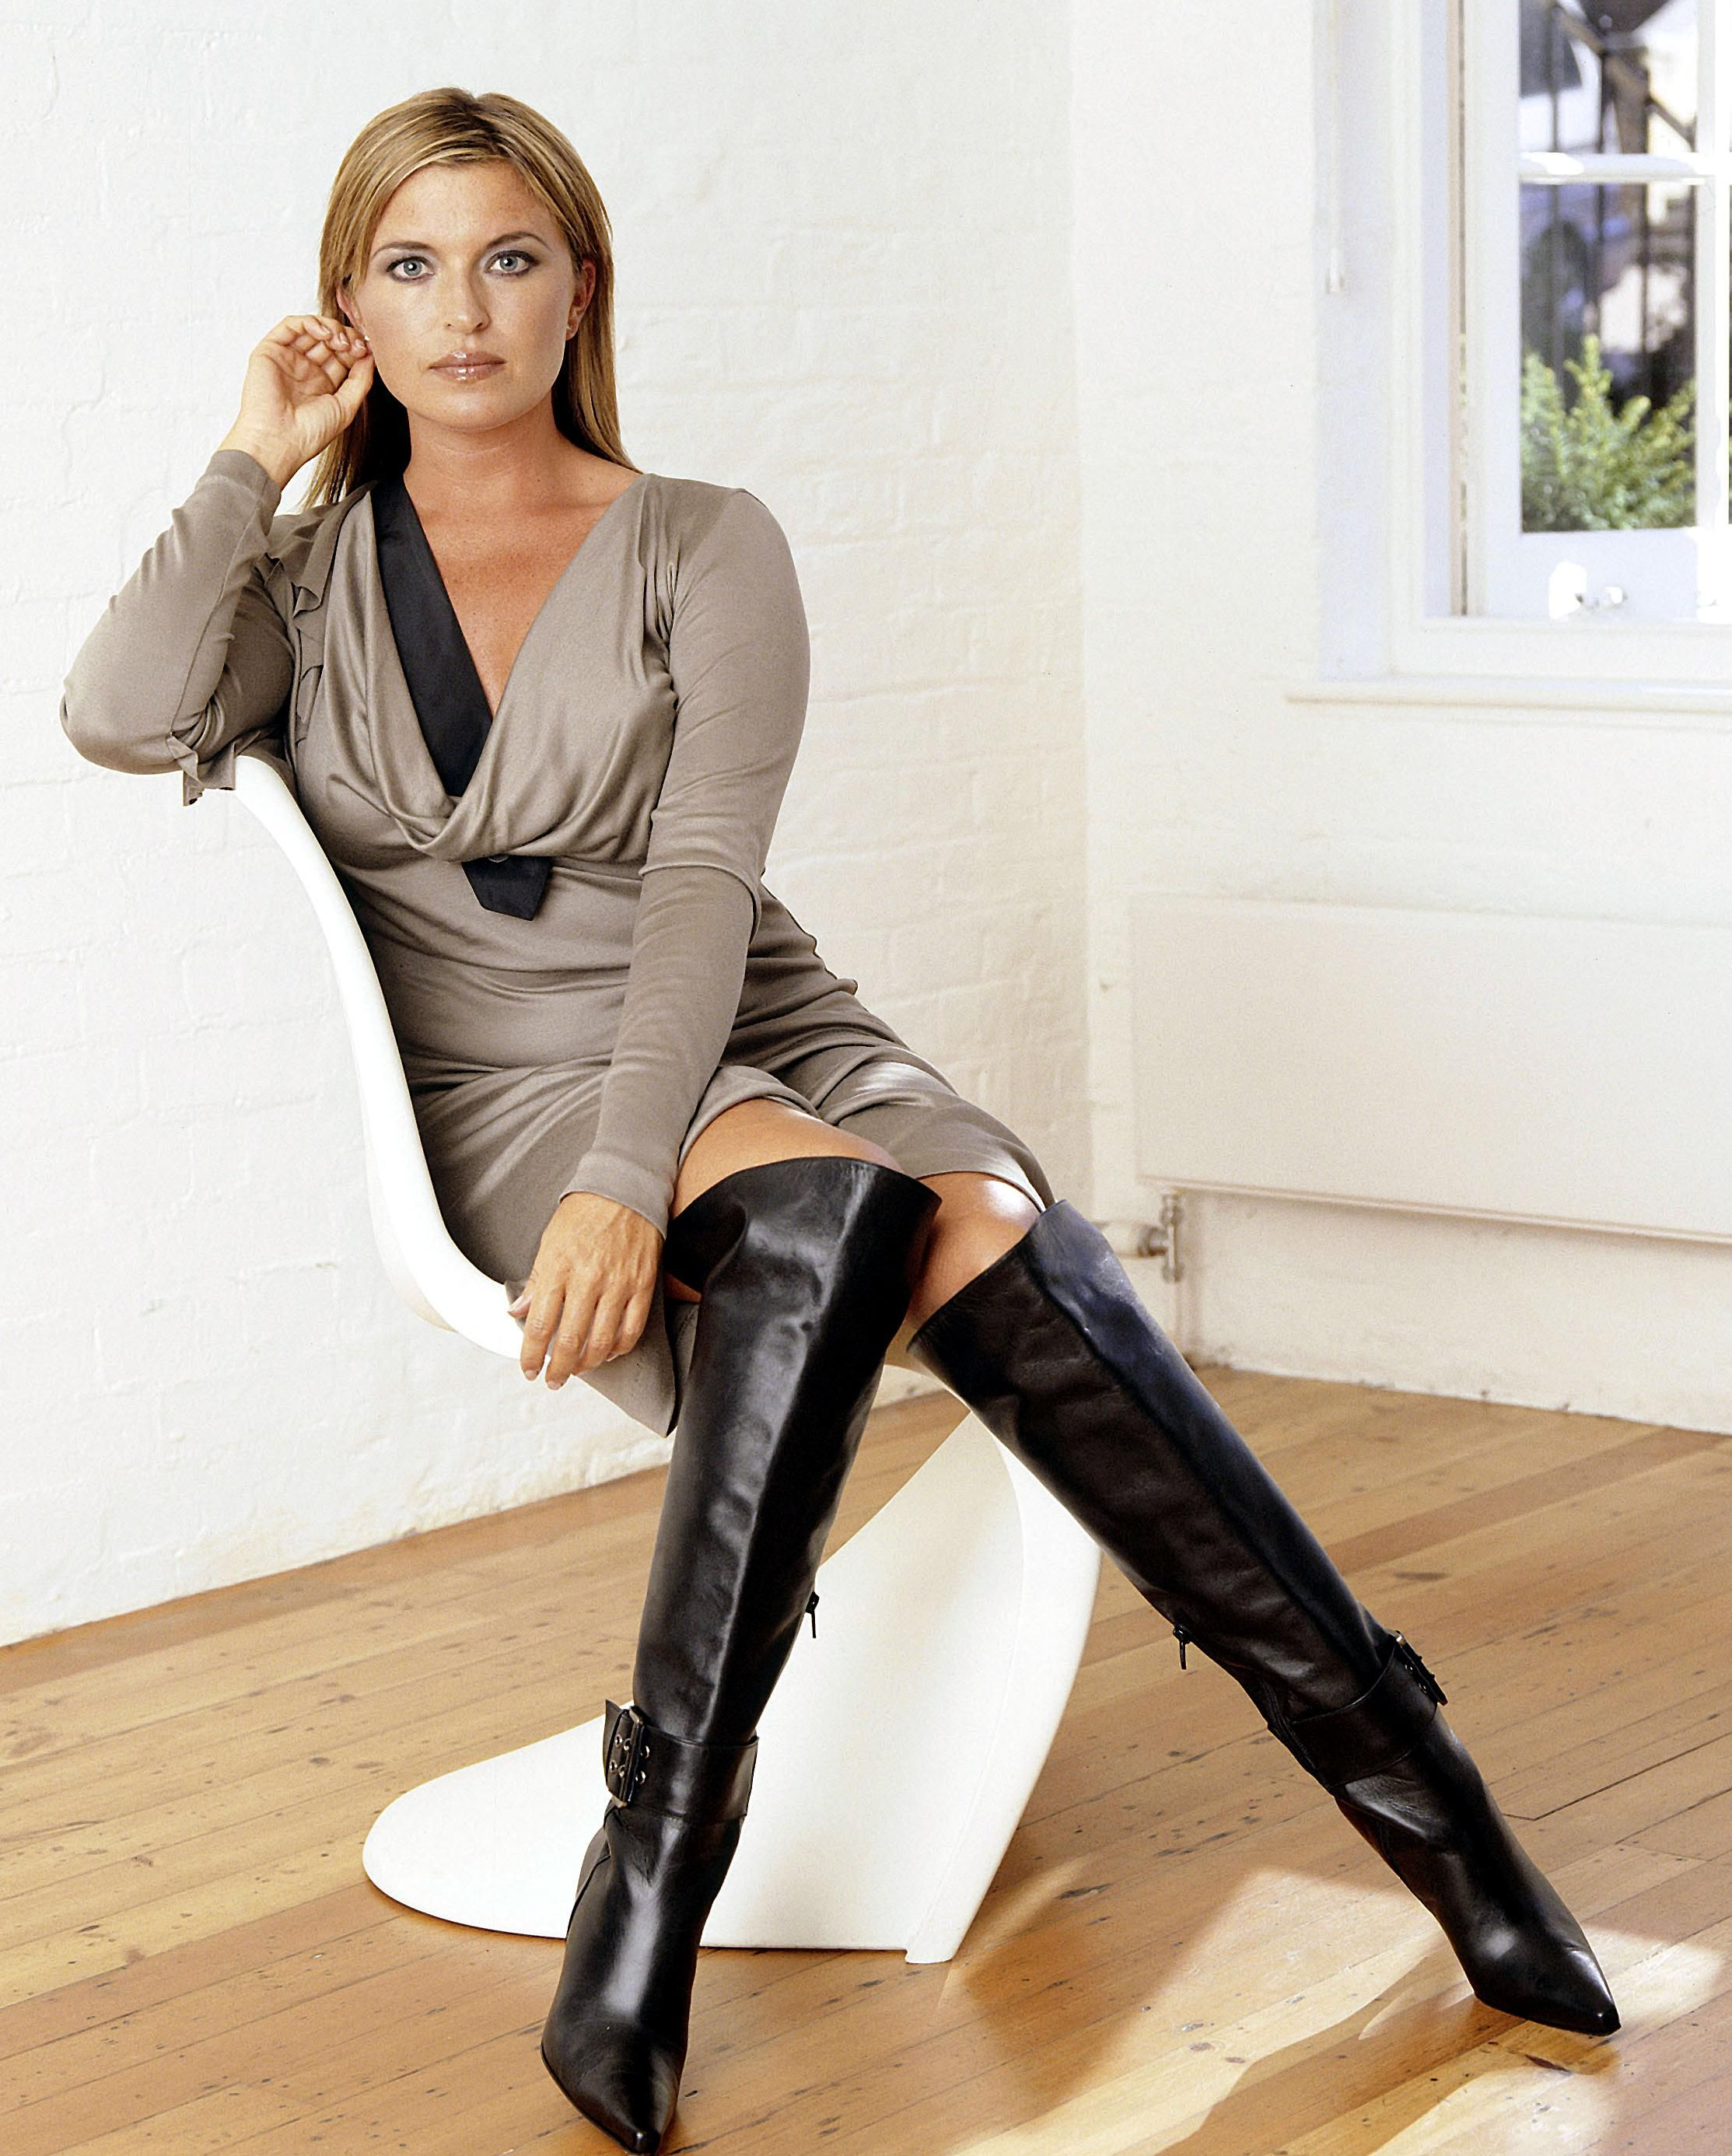 tina hobley | Women's Fashion | Pinterest